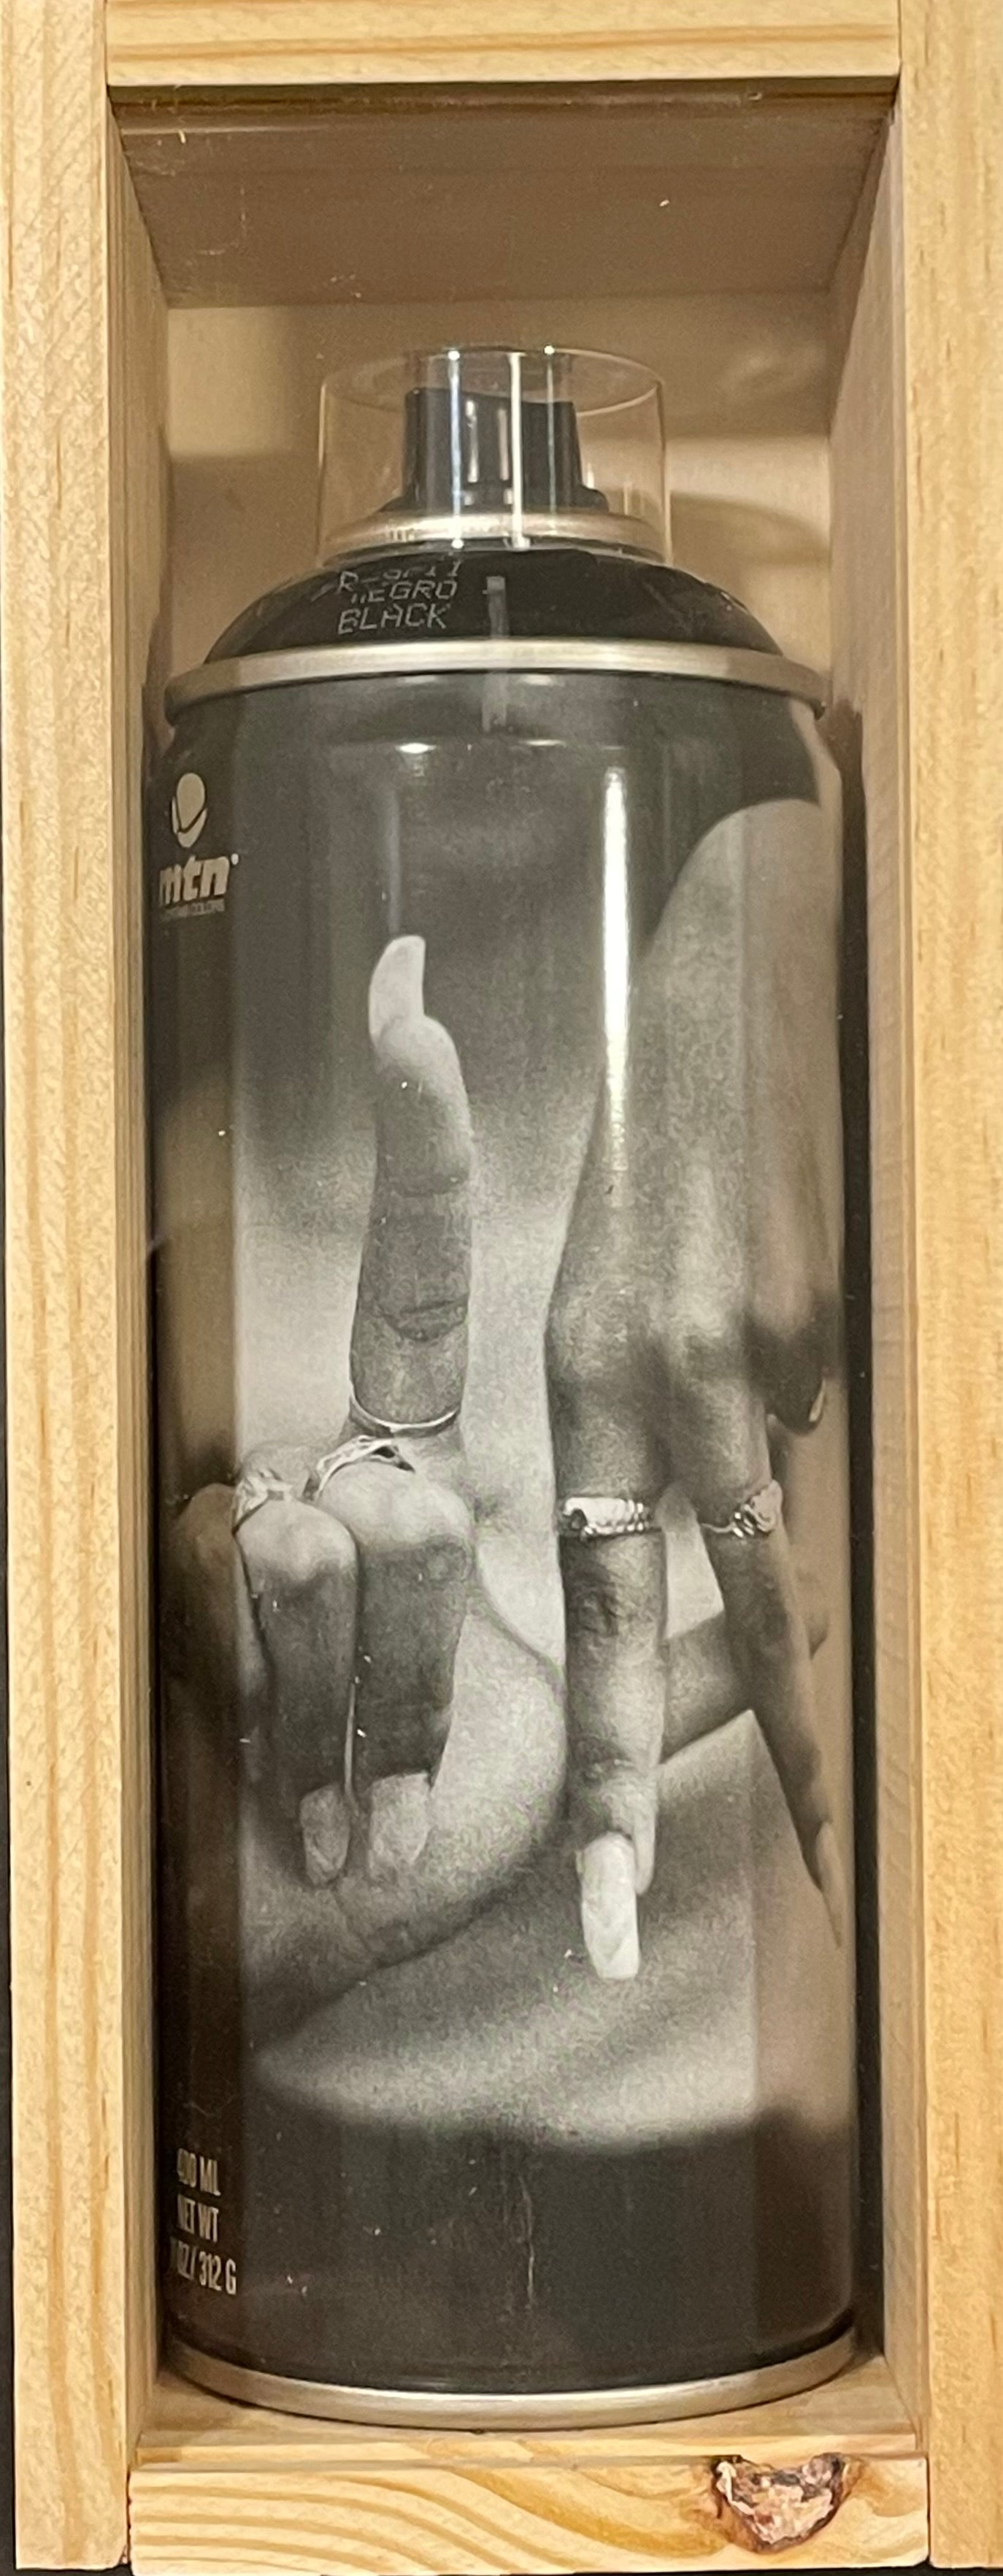 LA Fingers Signed Spray Can Estevan Oriol Los Angeles BTS Street Photography Art